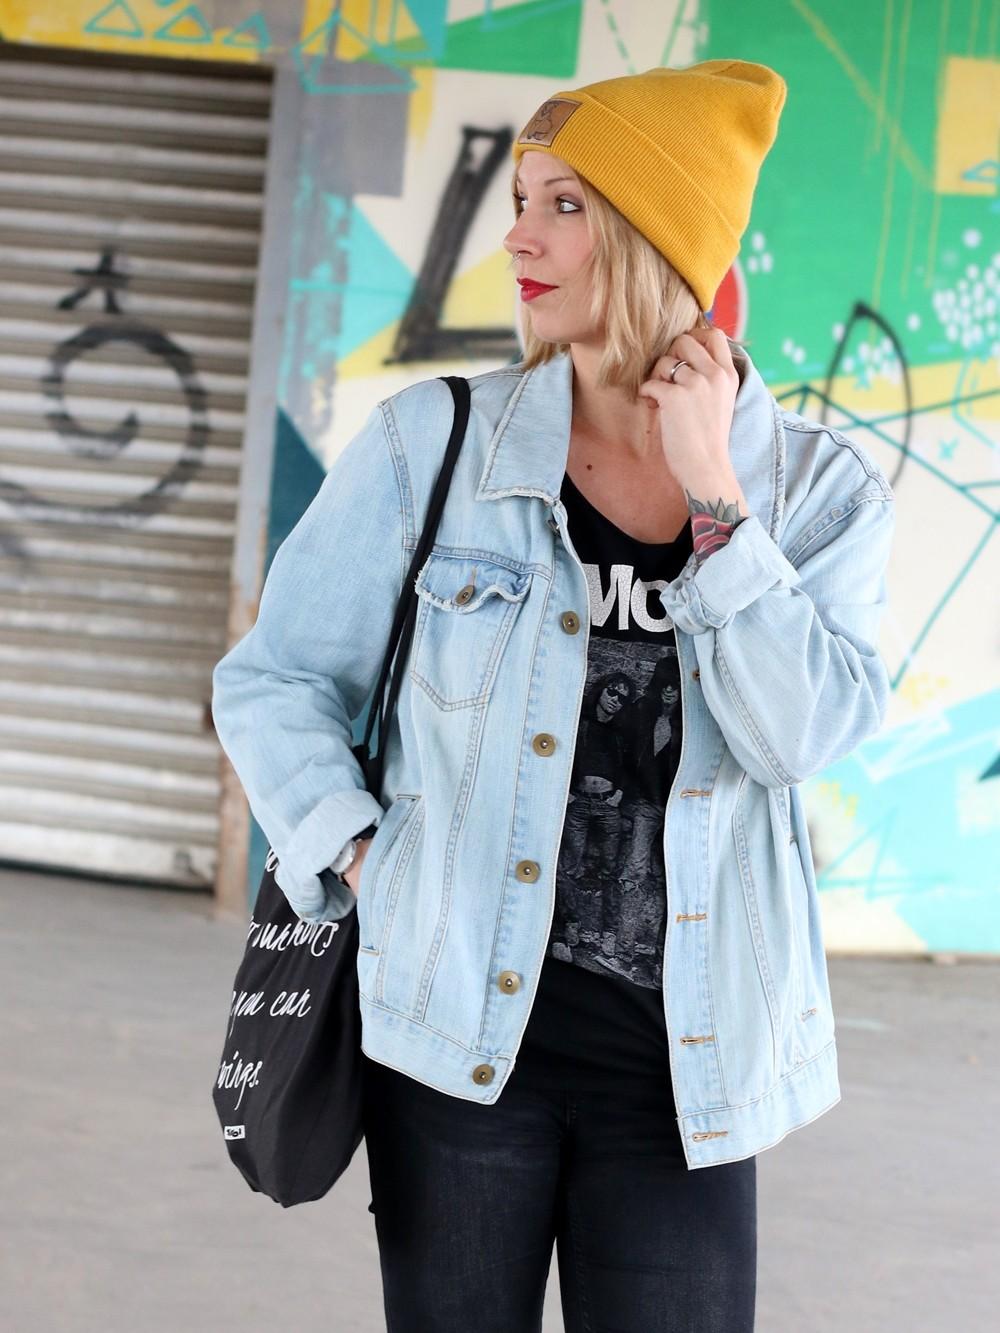 Fahionblogger Outfit Vans Disney Jeansjacke Beanie Fuchs Weebit (4)